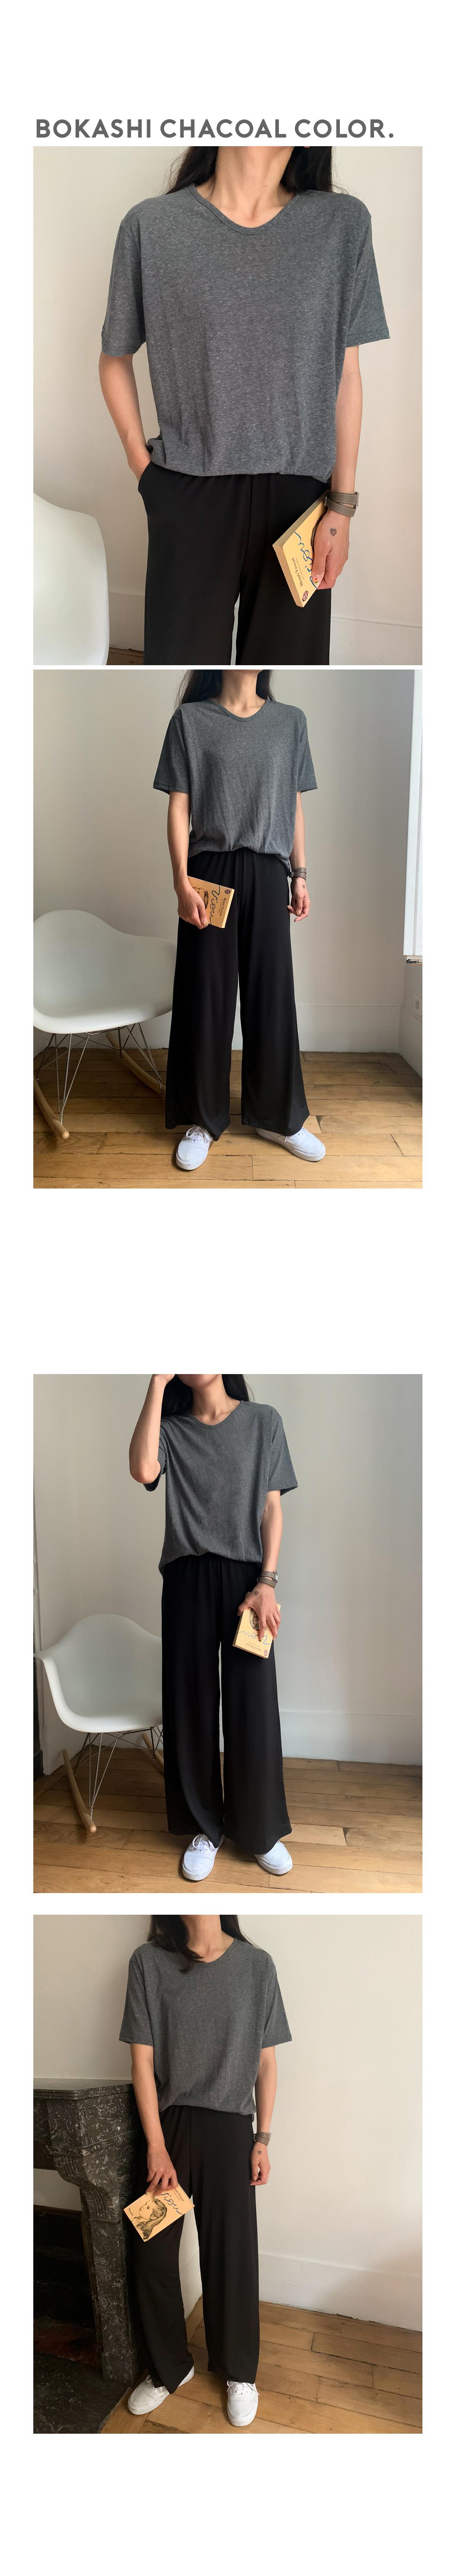 PBP. Summer Bokashi U-neck short-sleeved tee